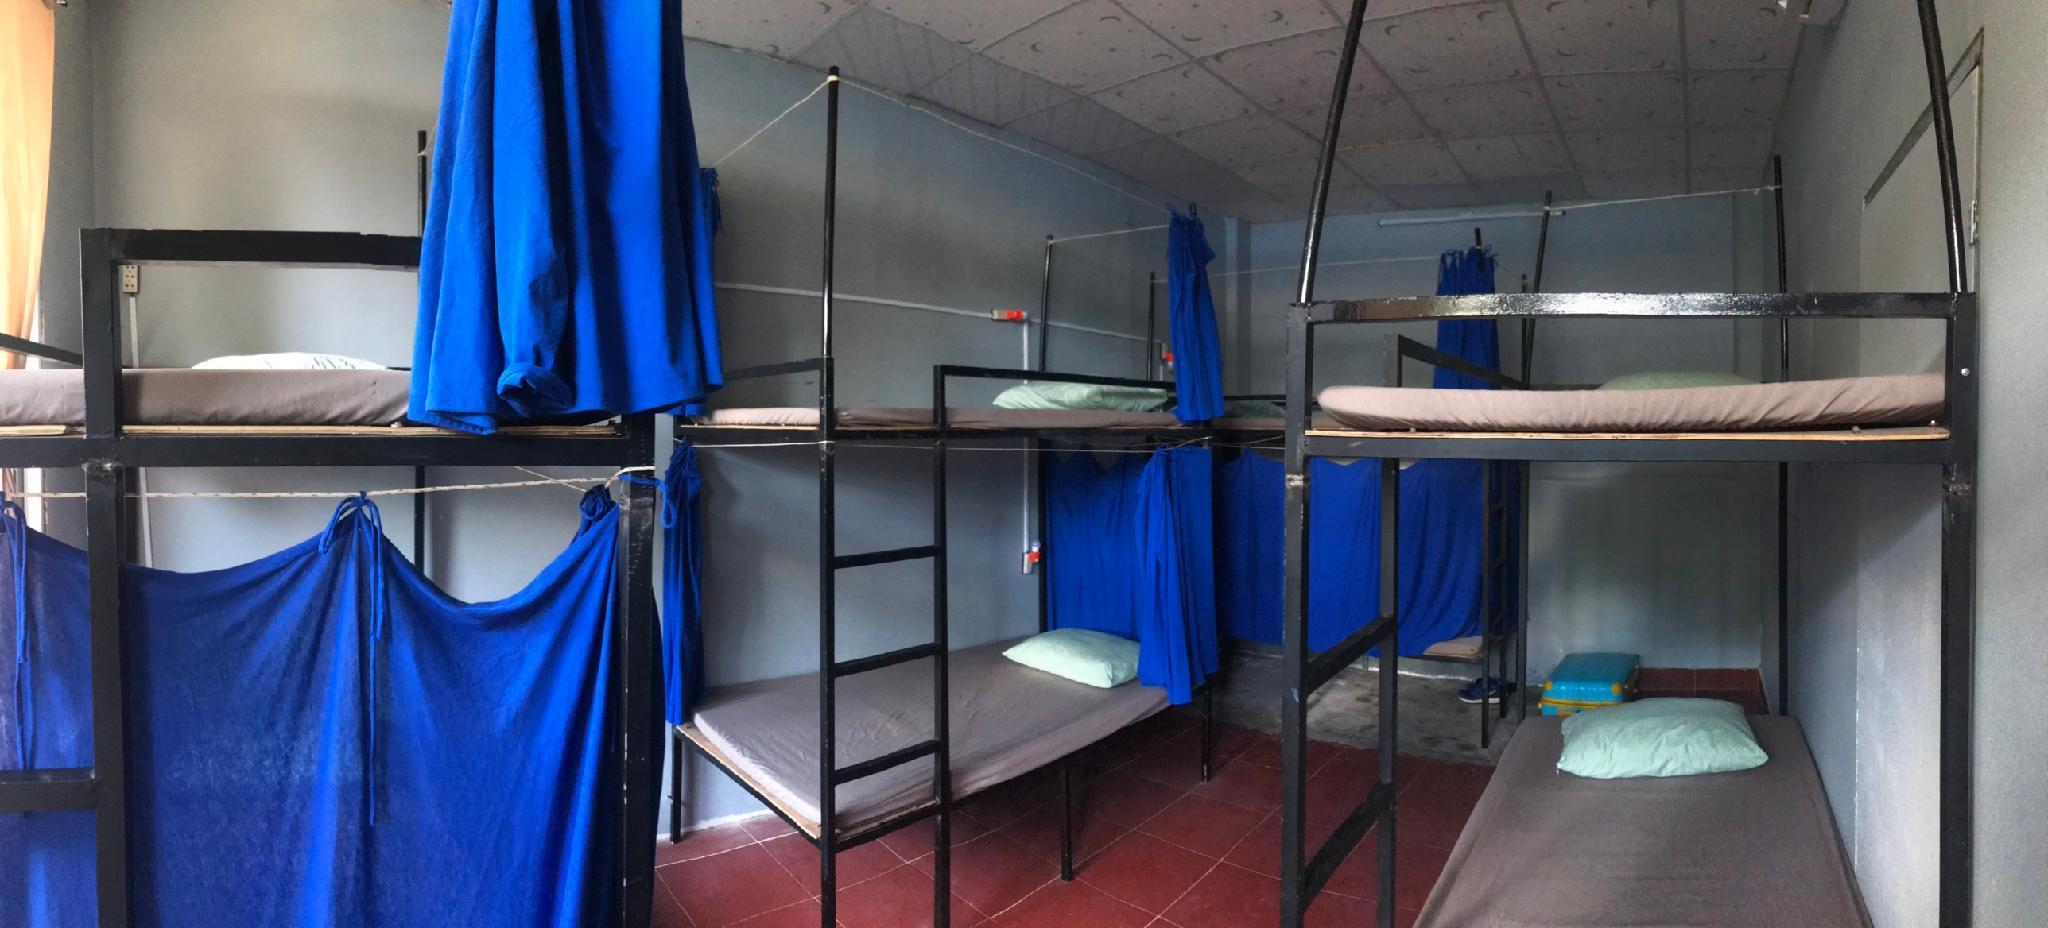 Dormitory   LoCo Home